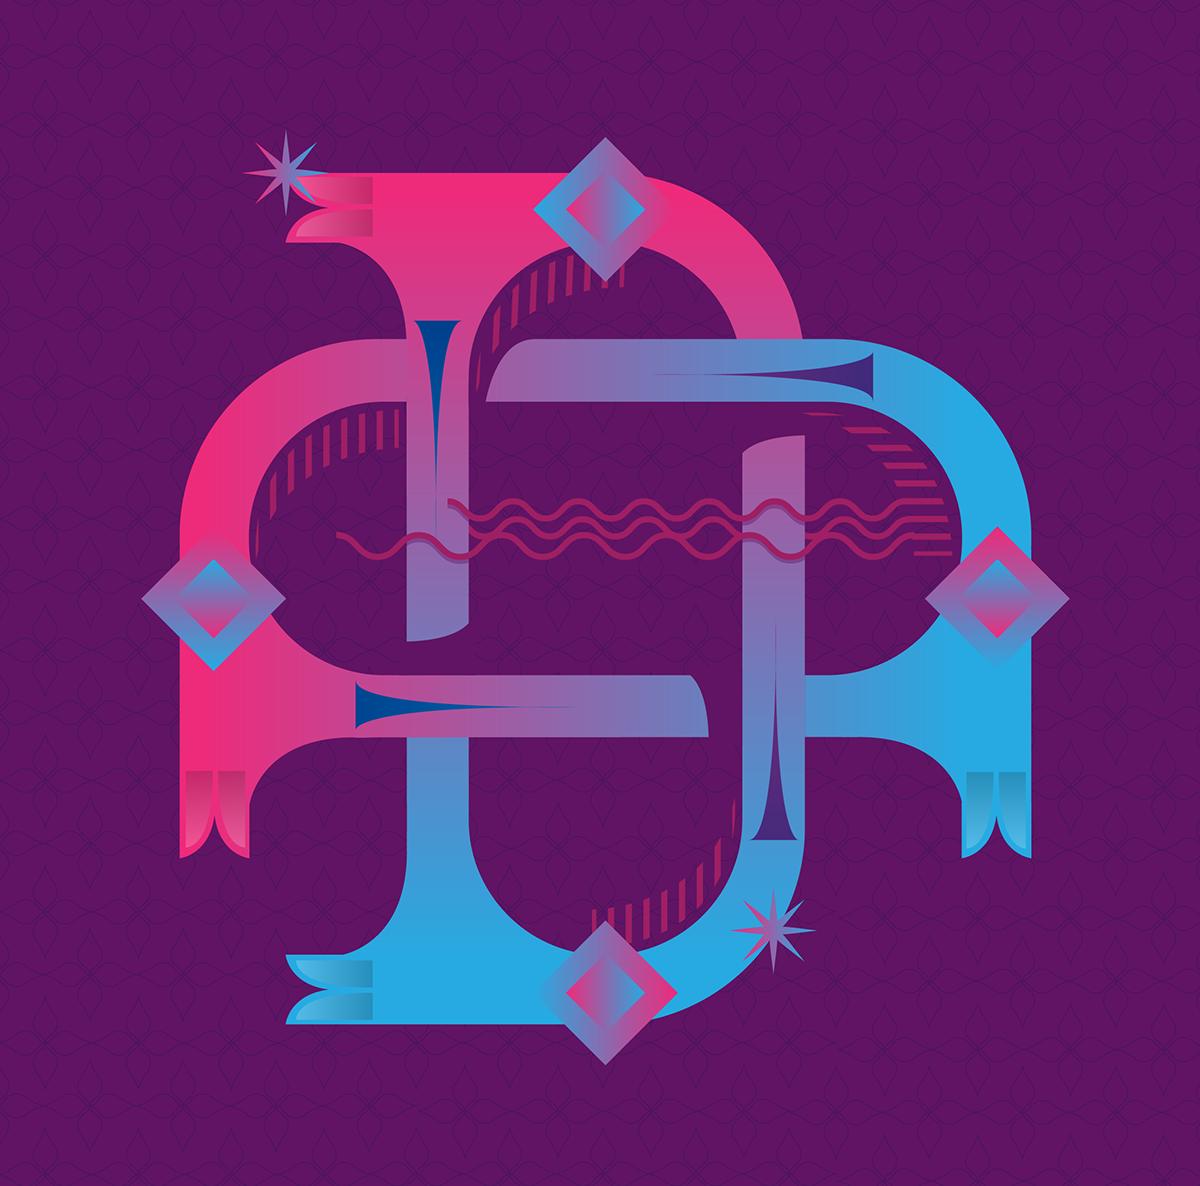 36daysoftype on Behance #typography #type #illustration